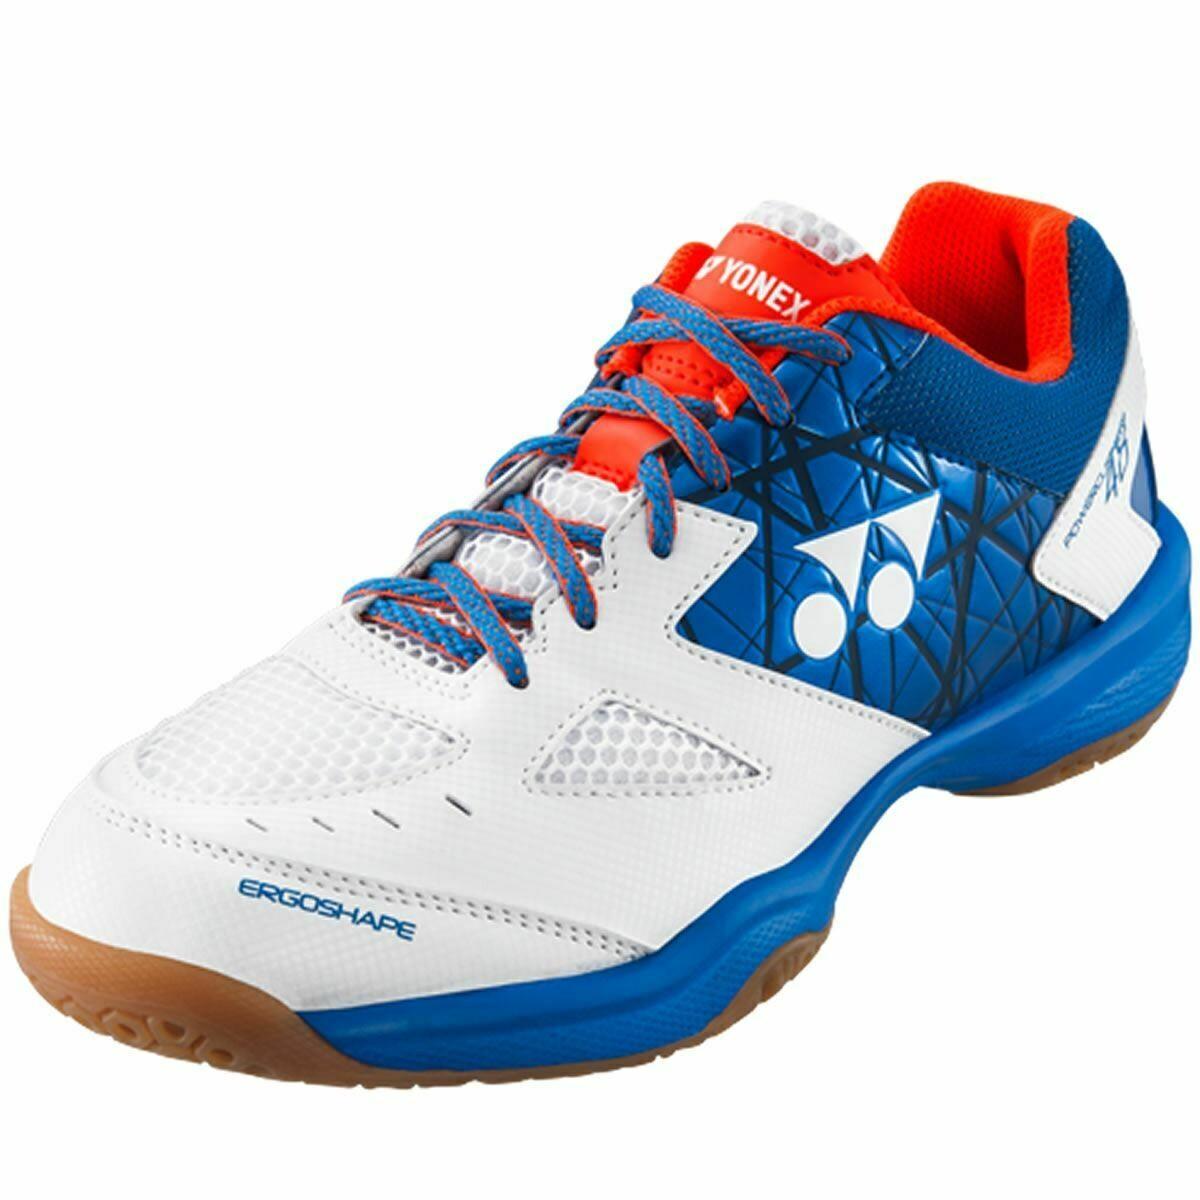 Yonex Power Cushion 48 Badminton Shoes - White